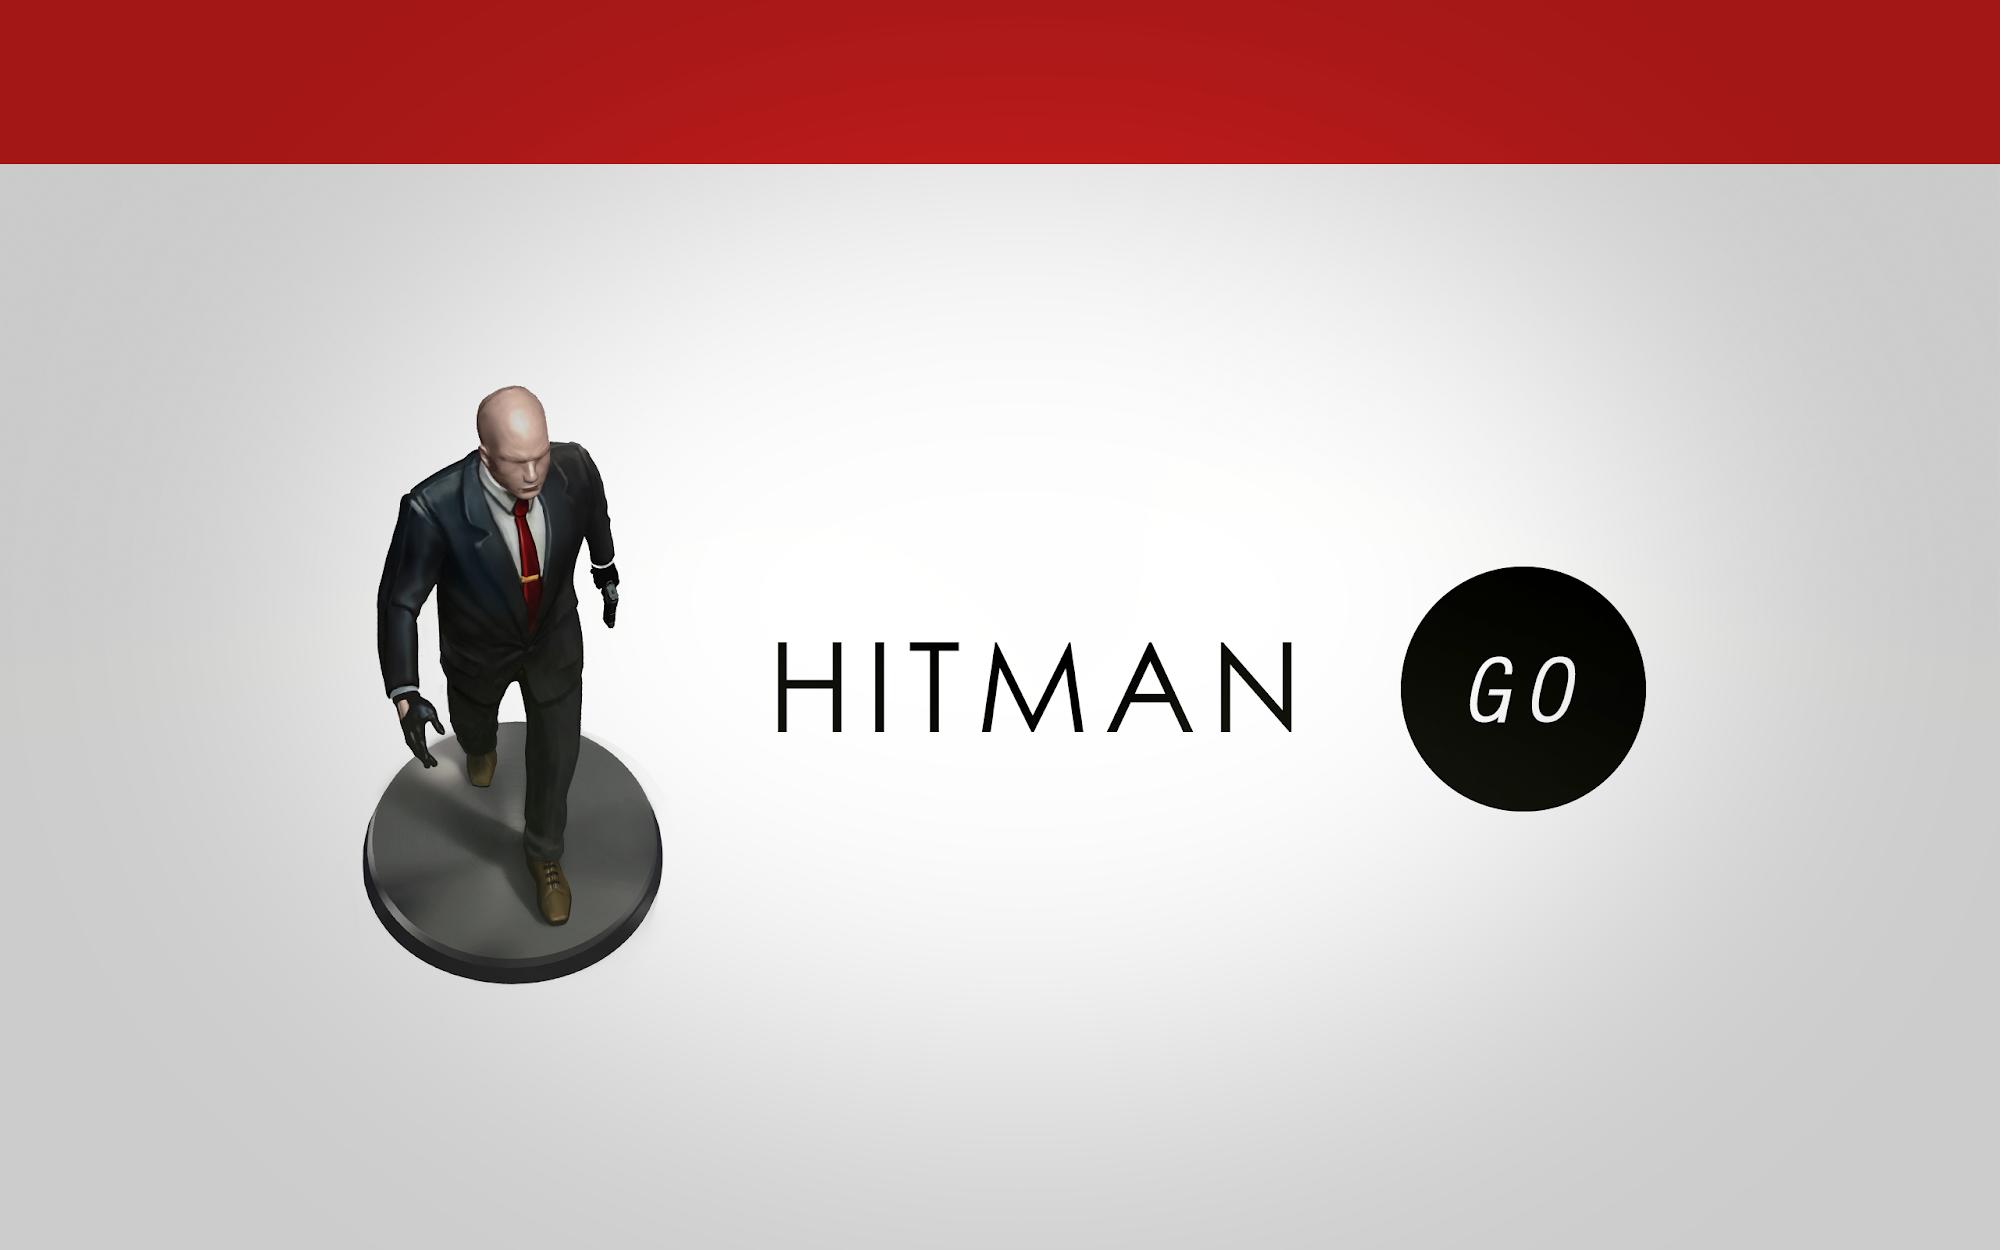 Hitman GO screenshot #6